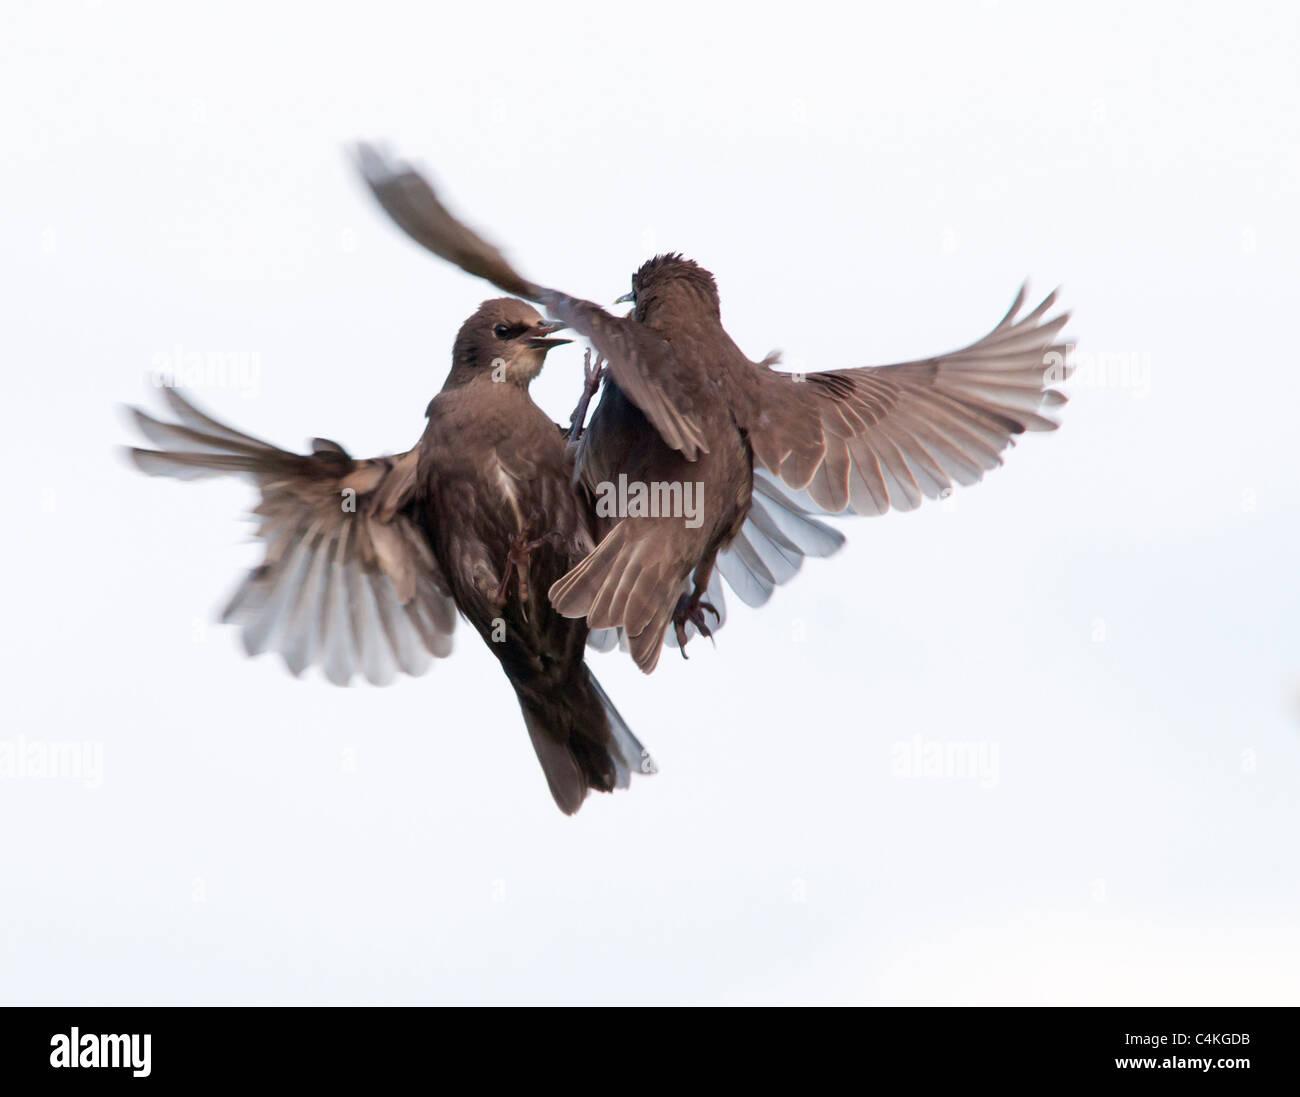 Two Juvenile Starlings quarreling in flight - Stock Image